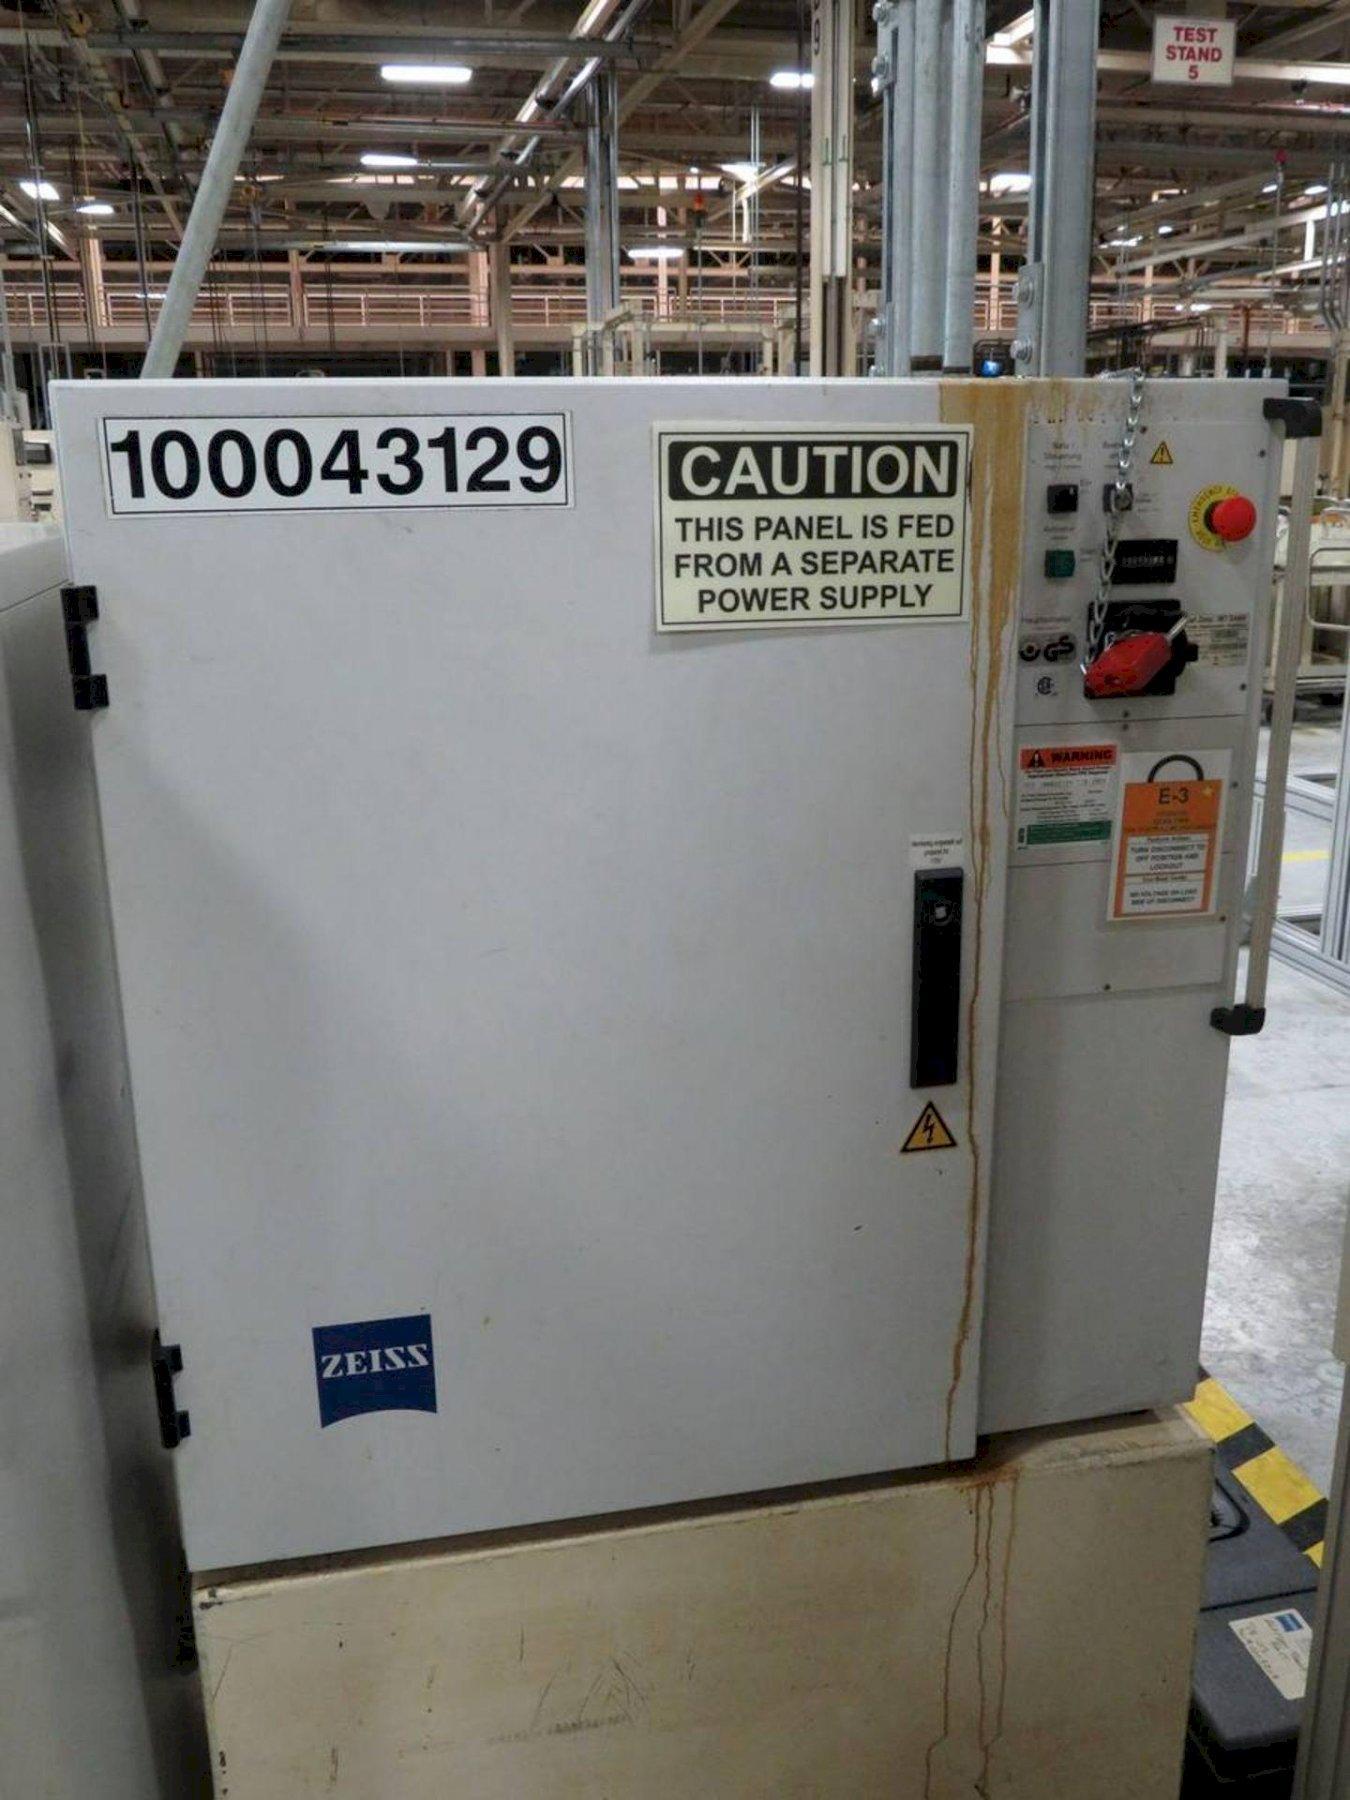 ZEISSZeiss Centermax 11/12/7 Coordinate Measuring Machine (CMM)